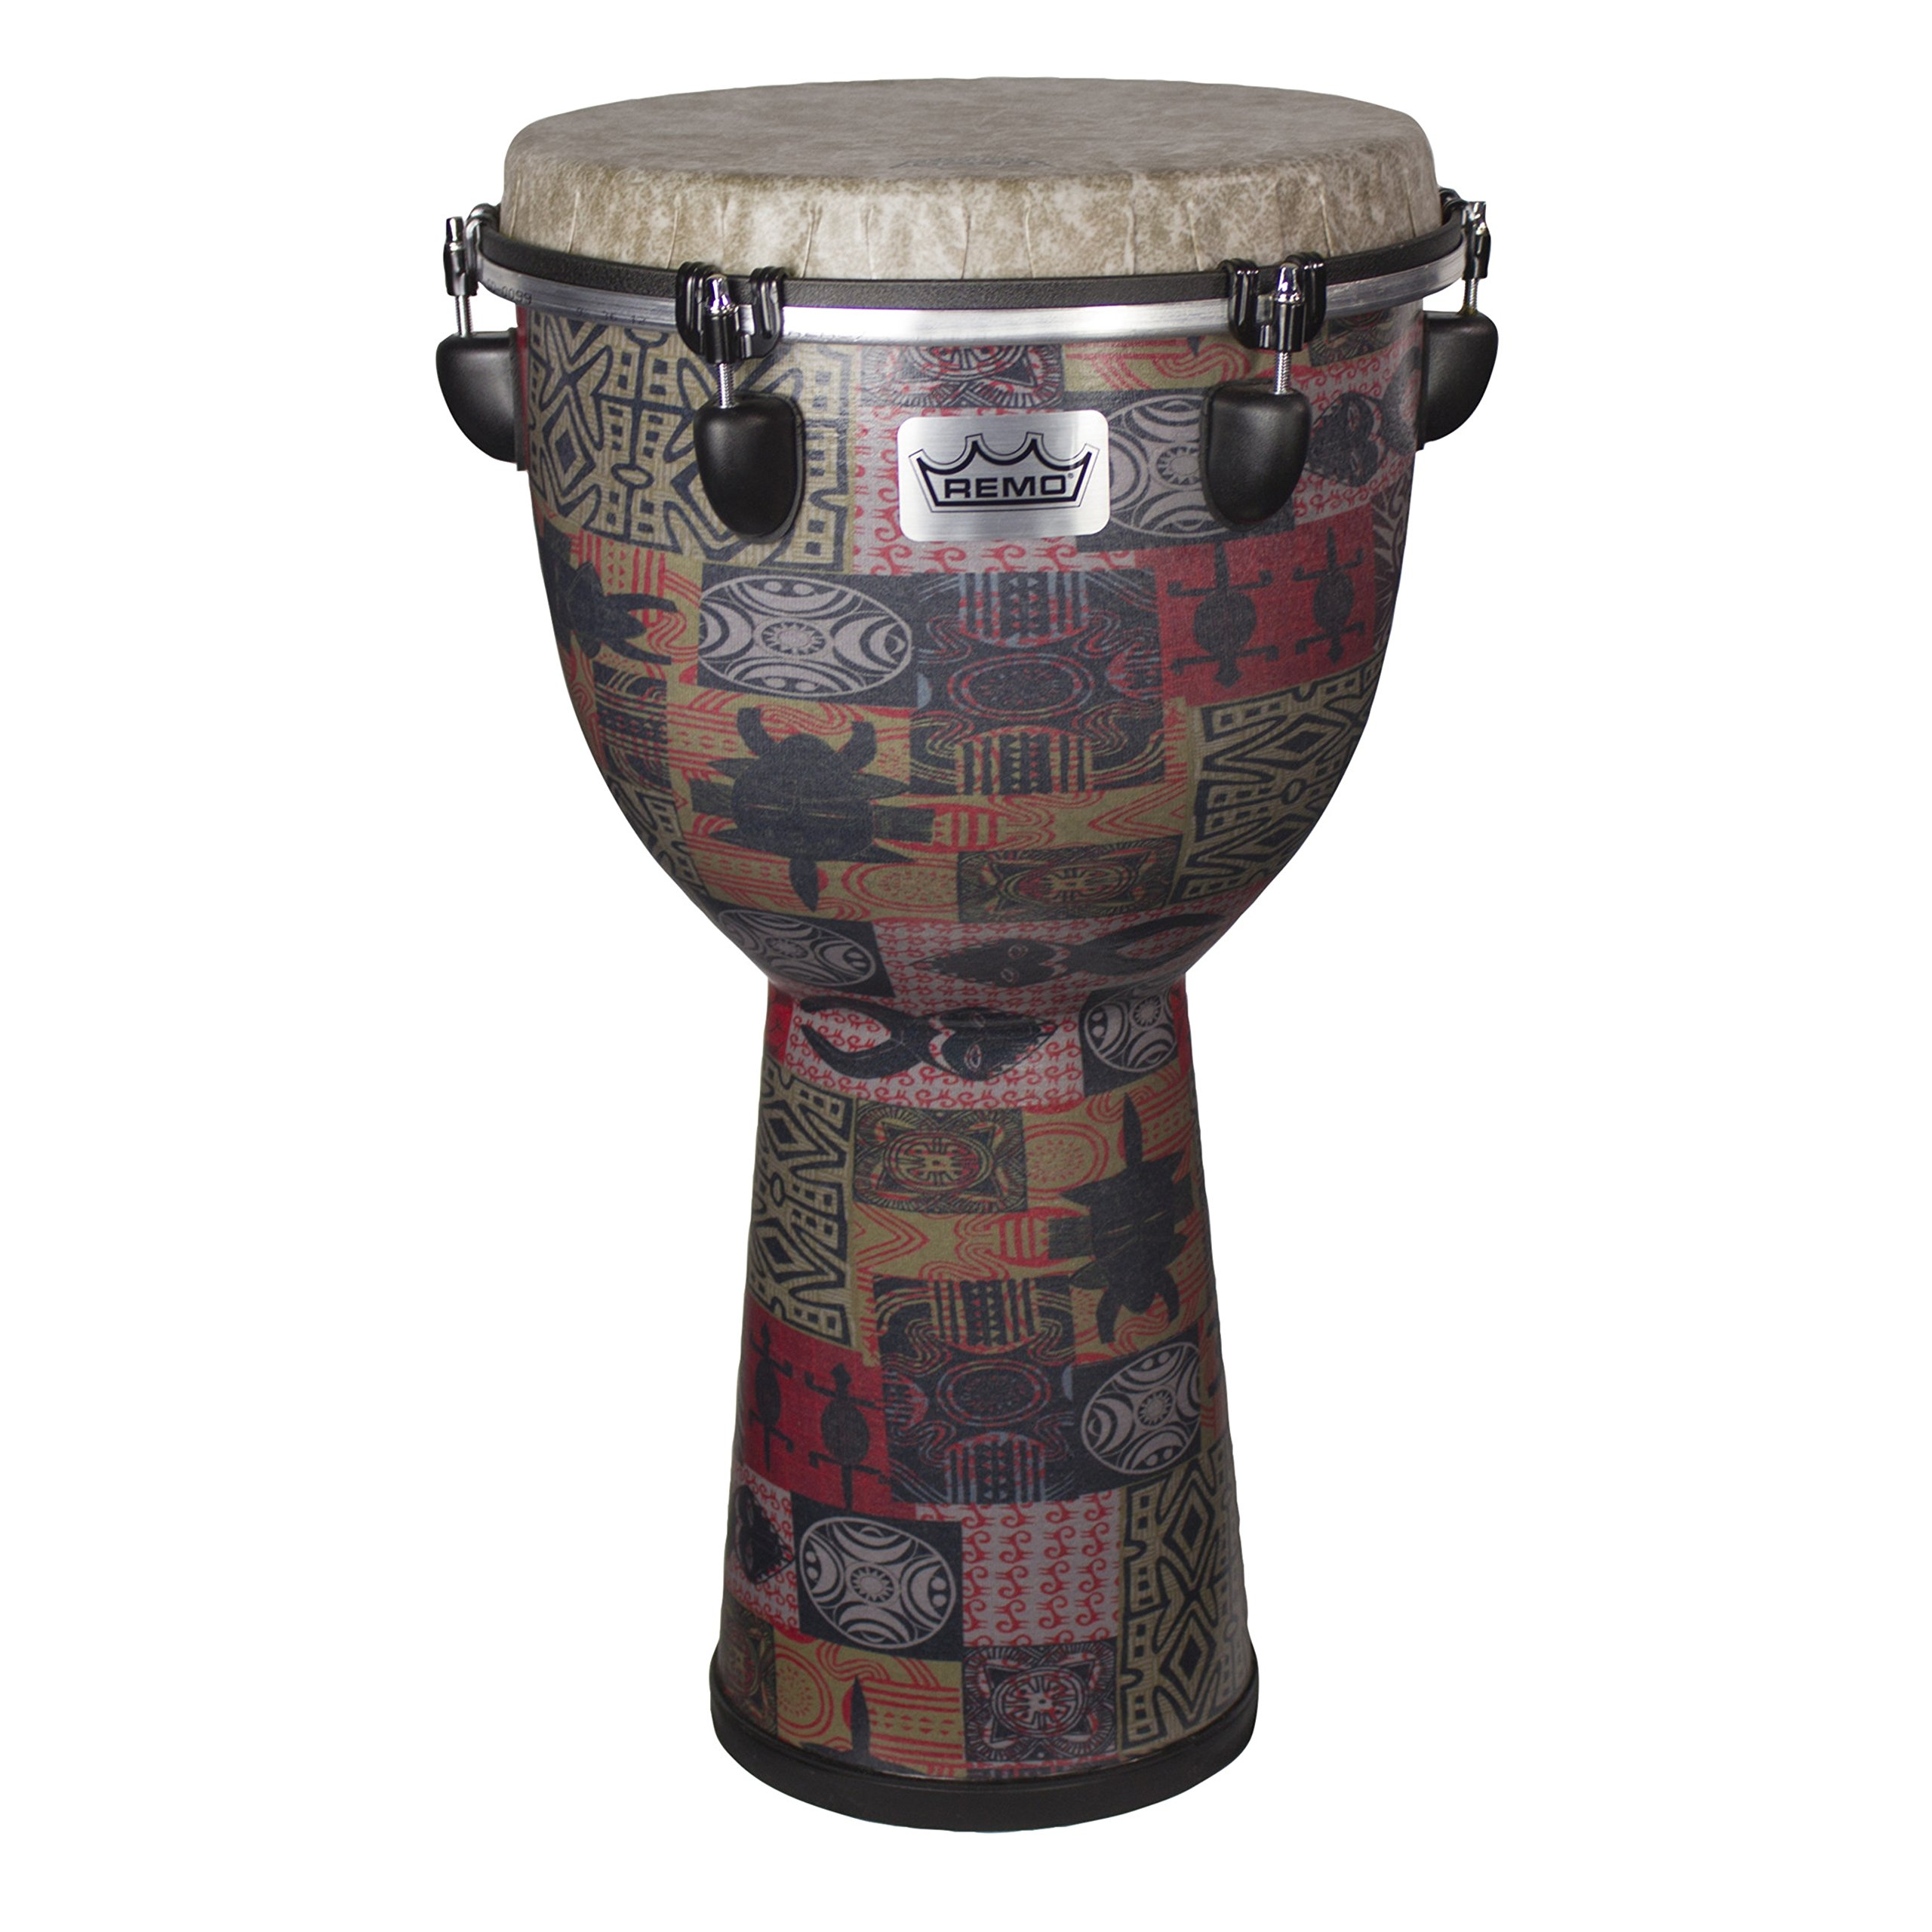 Remo DJ-6112-57 Apex Djembe Drum - Red Kinte, 12''